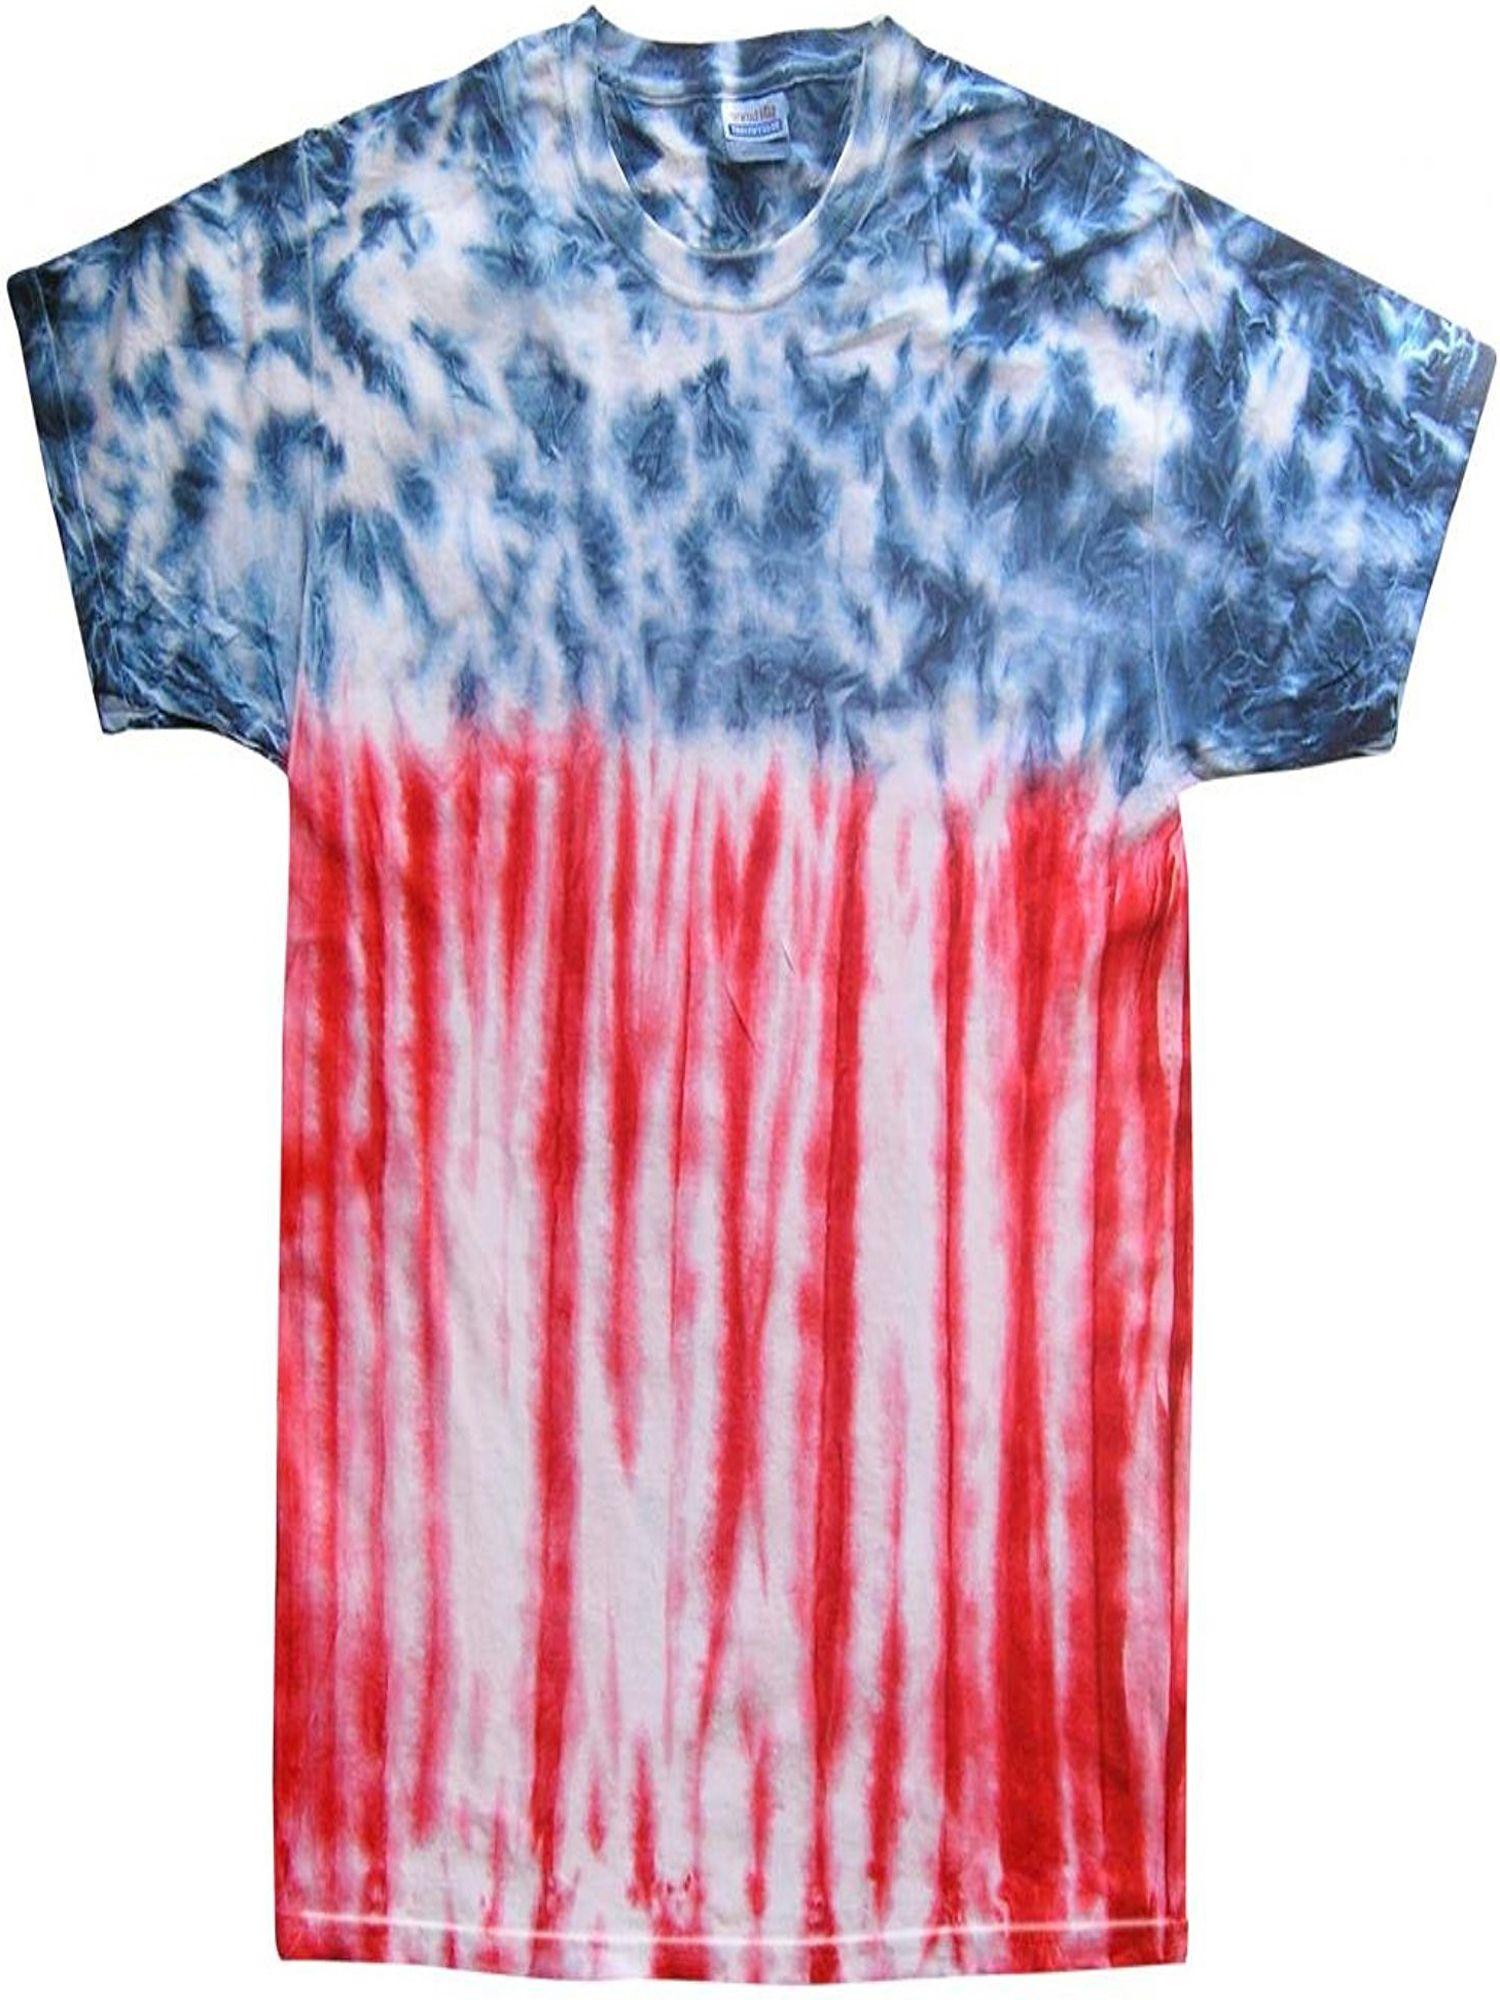 Buy Cool Shirts Mens Patriotic Flag Tie Dye Flag T Shirt Medium Walmart Com In 2020 Tie Dye Shirts How To Tie Dye Tye Dye Shirts